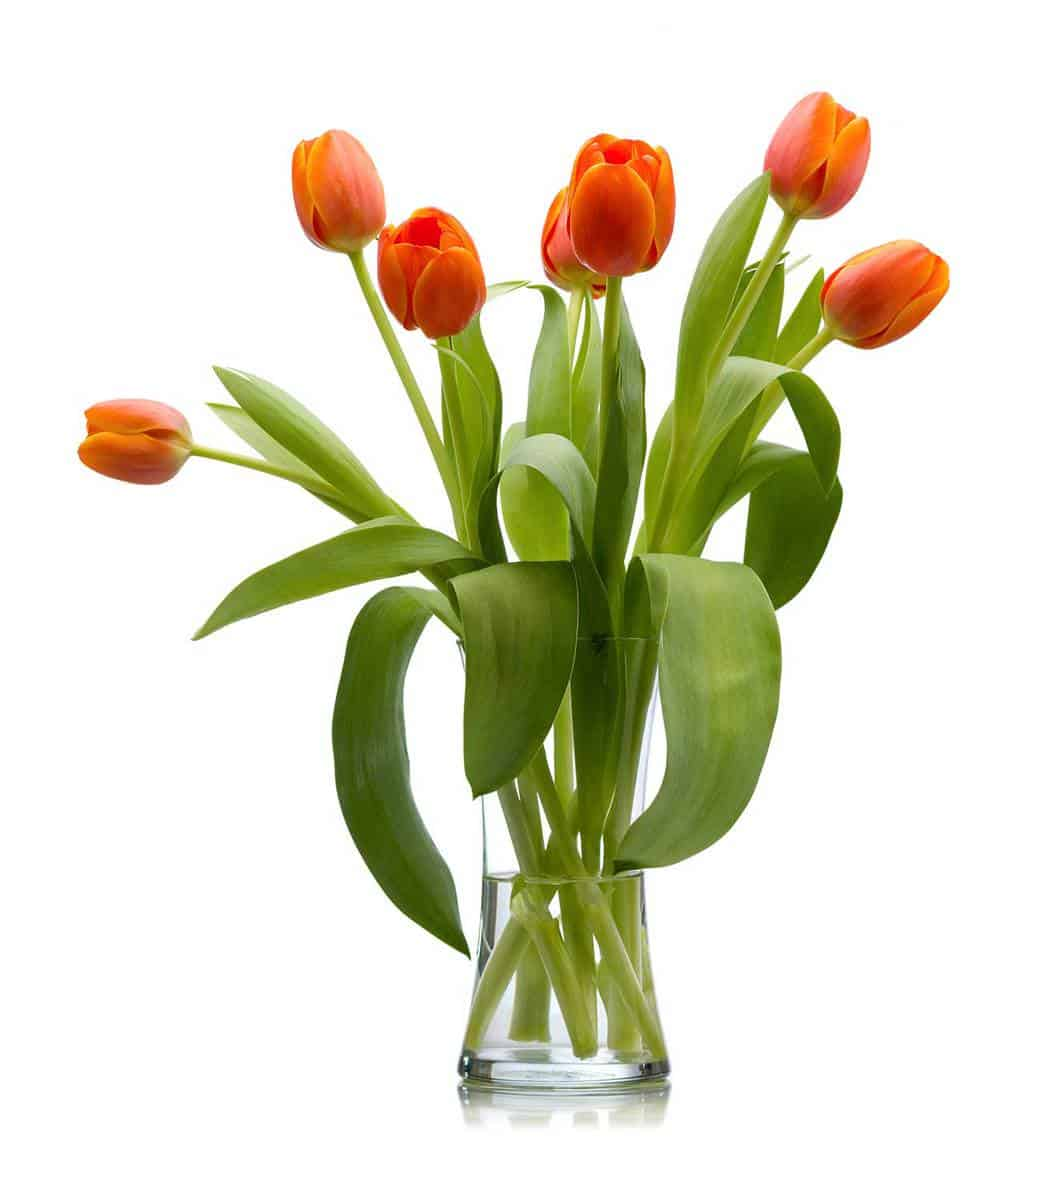 Seven-red-orange-fresh-cut-tulips-In-glass-vase